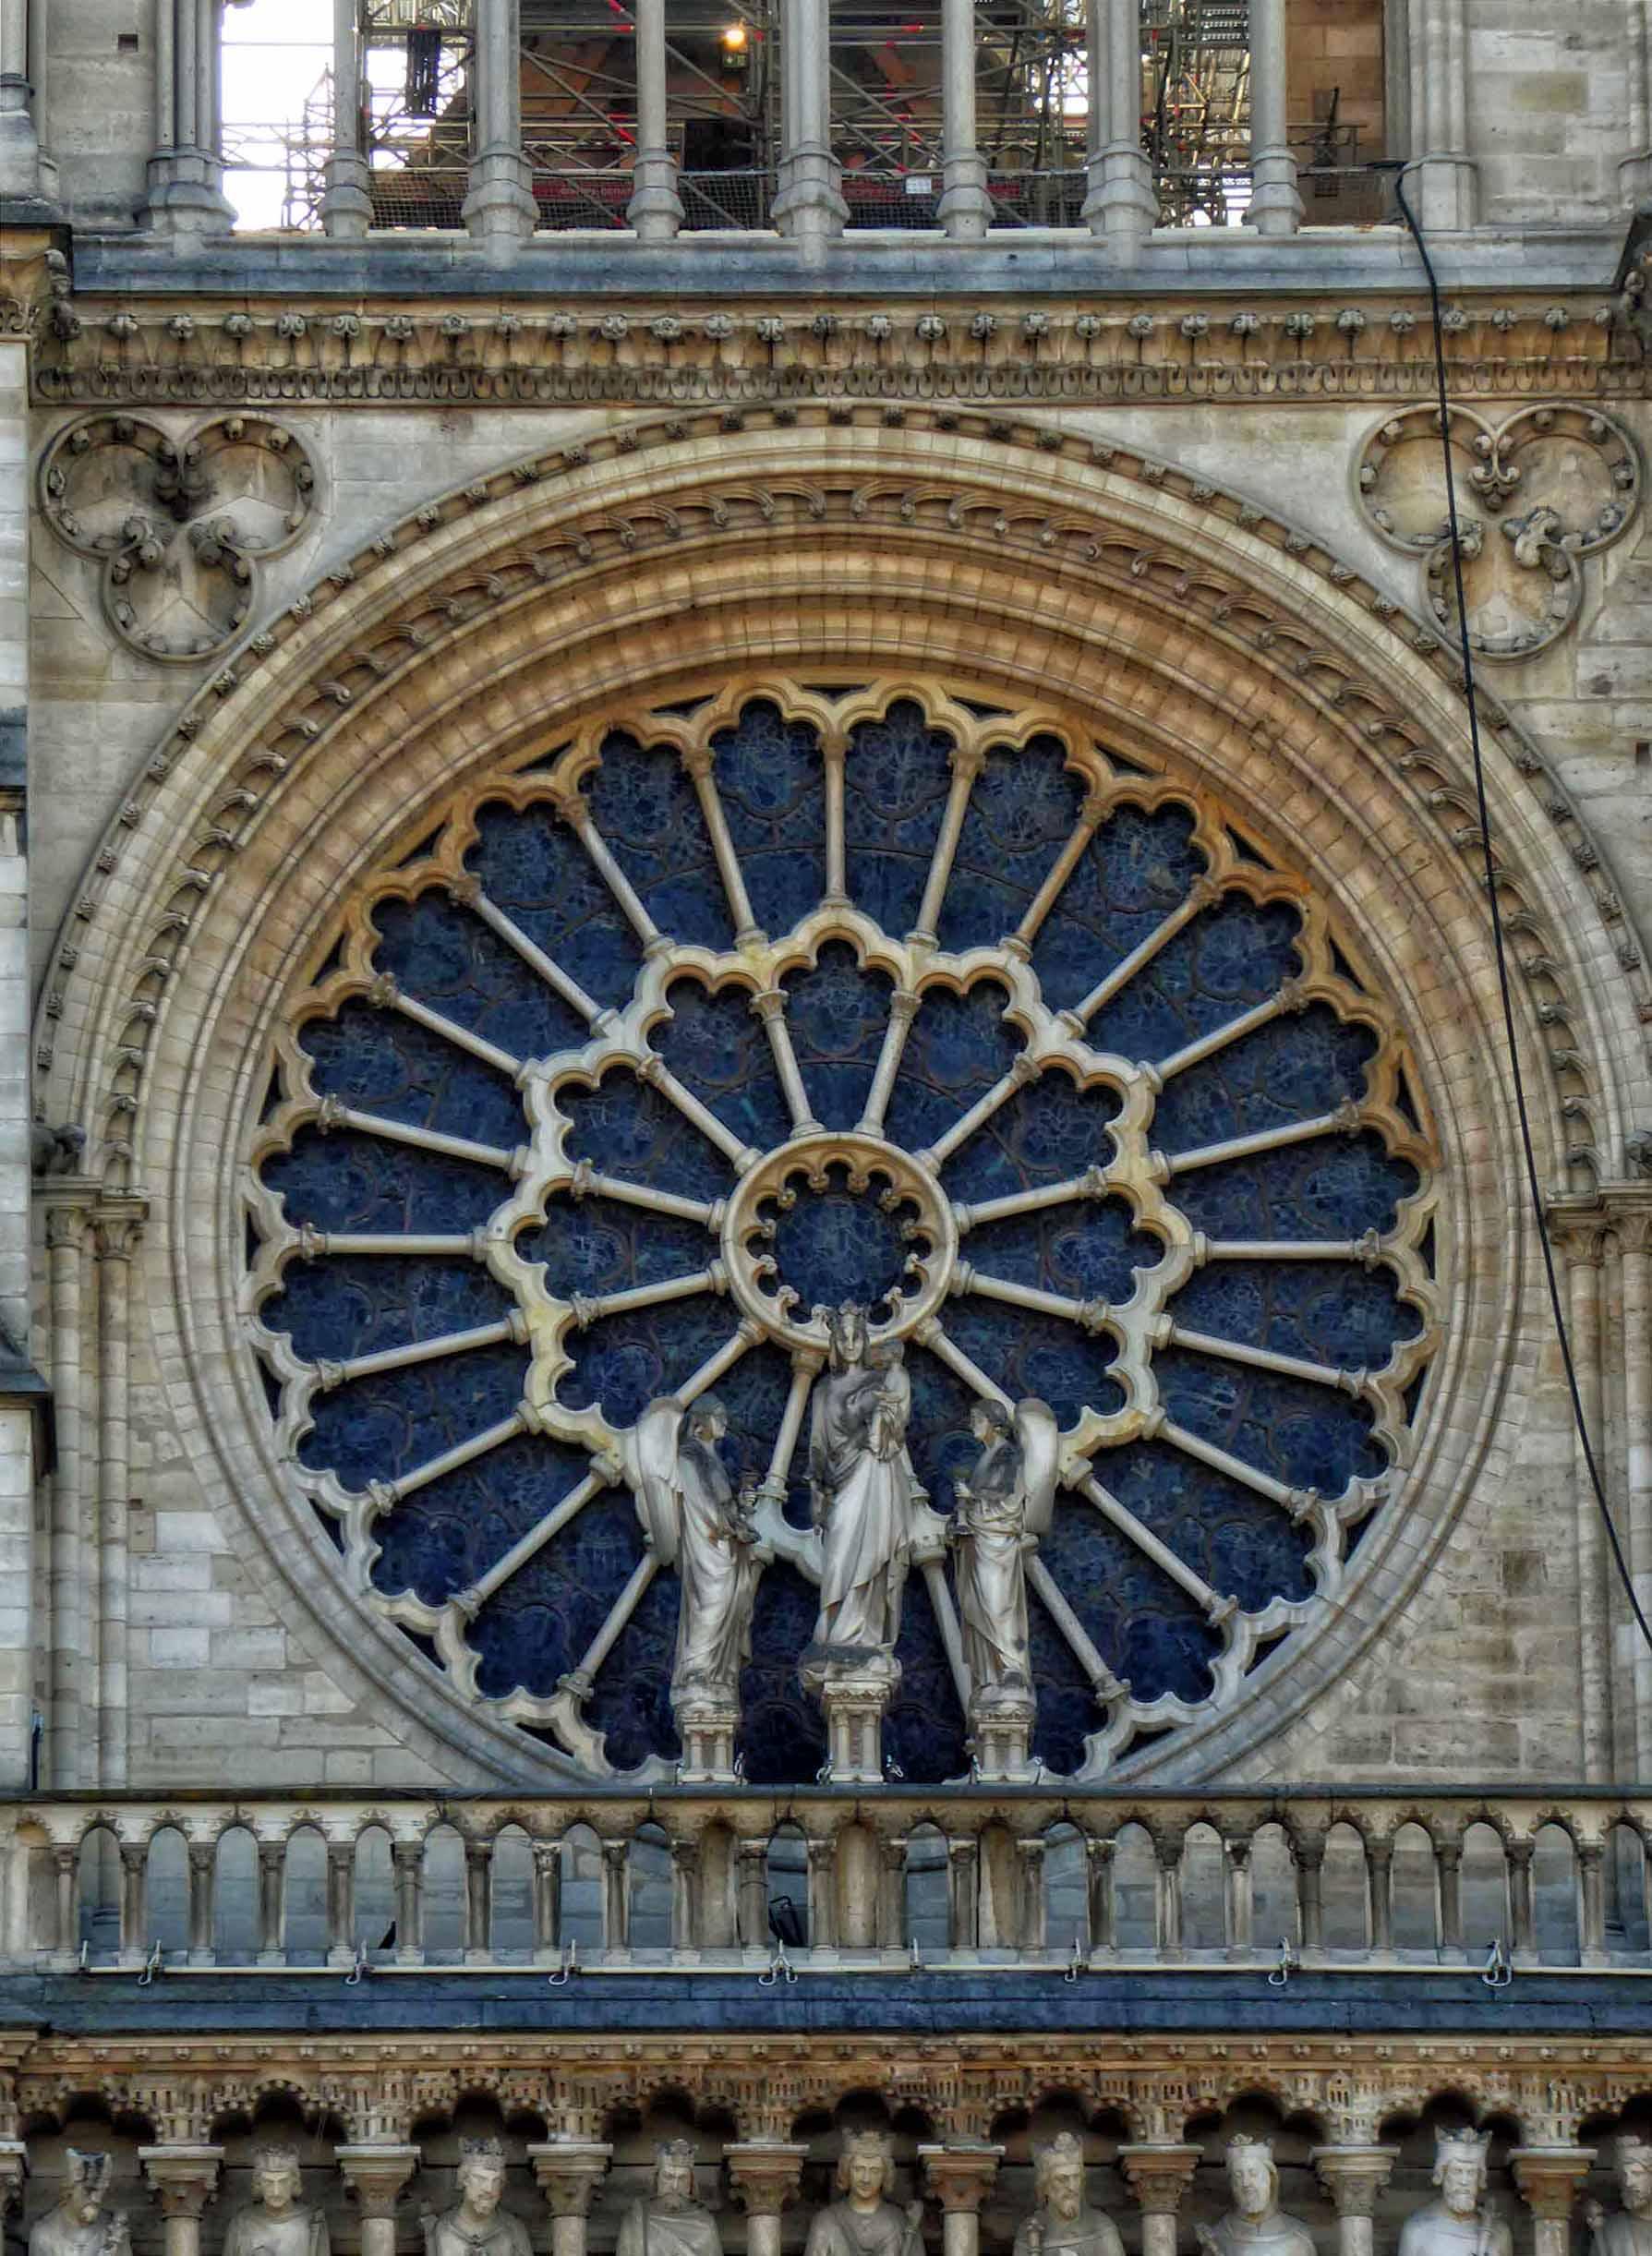 Large round decorative window